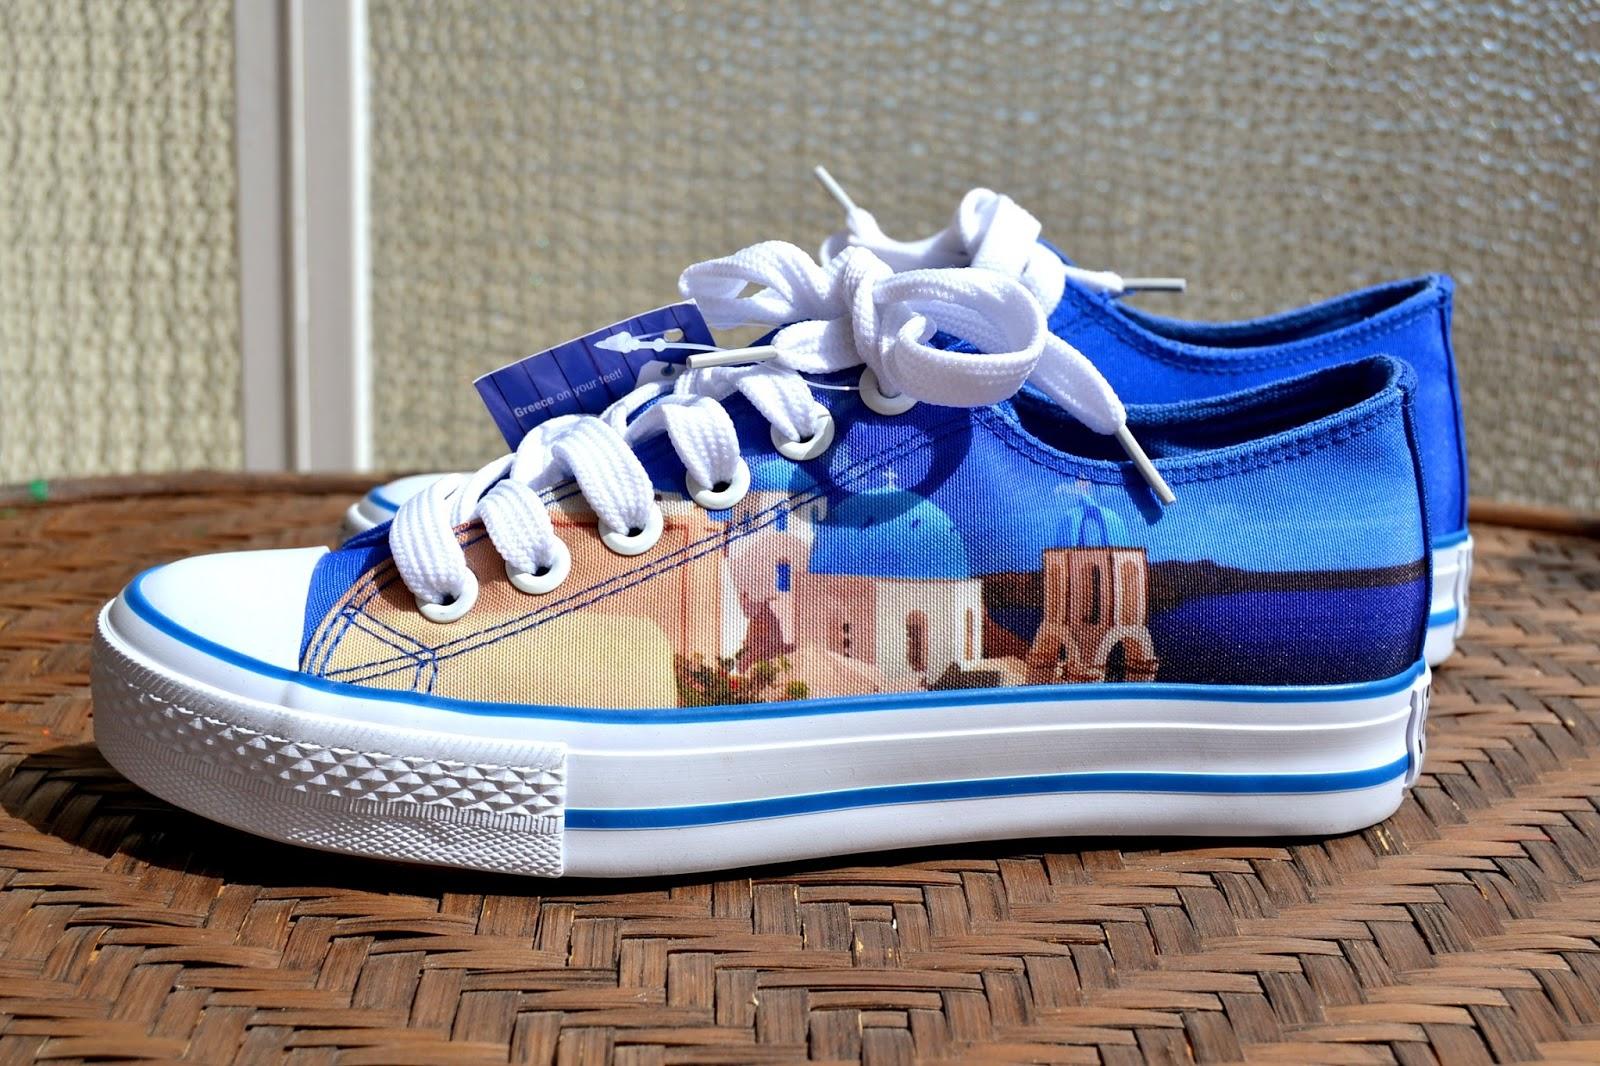 http://www.syriouslyinfashion.com/2014/09/santorini-print-sneakers.html